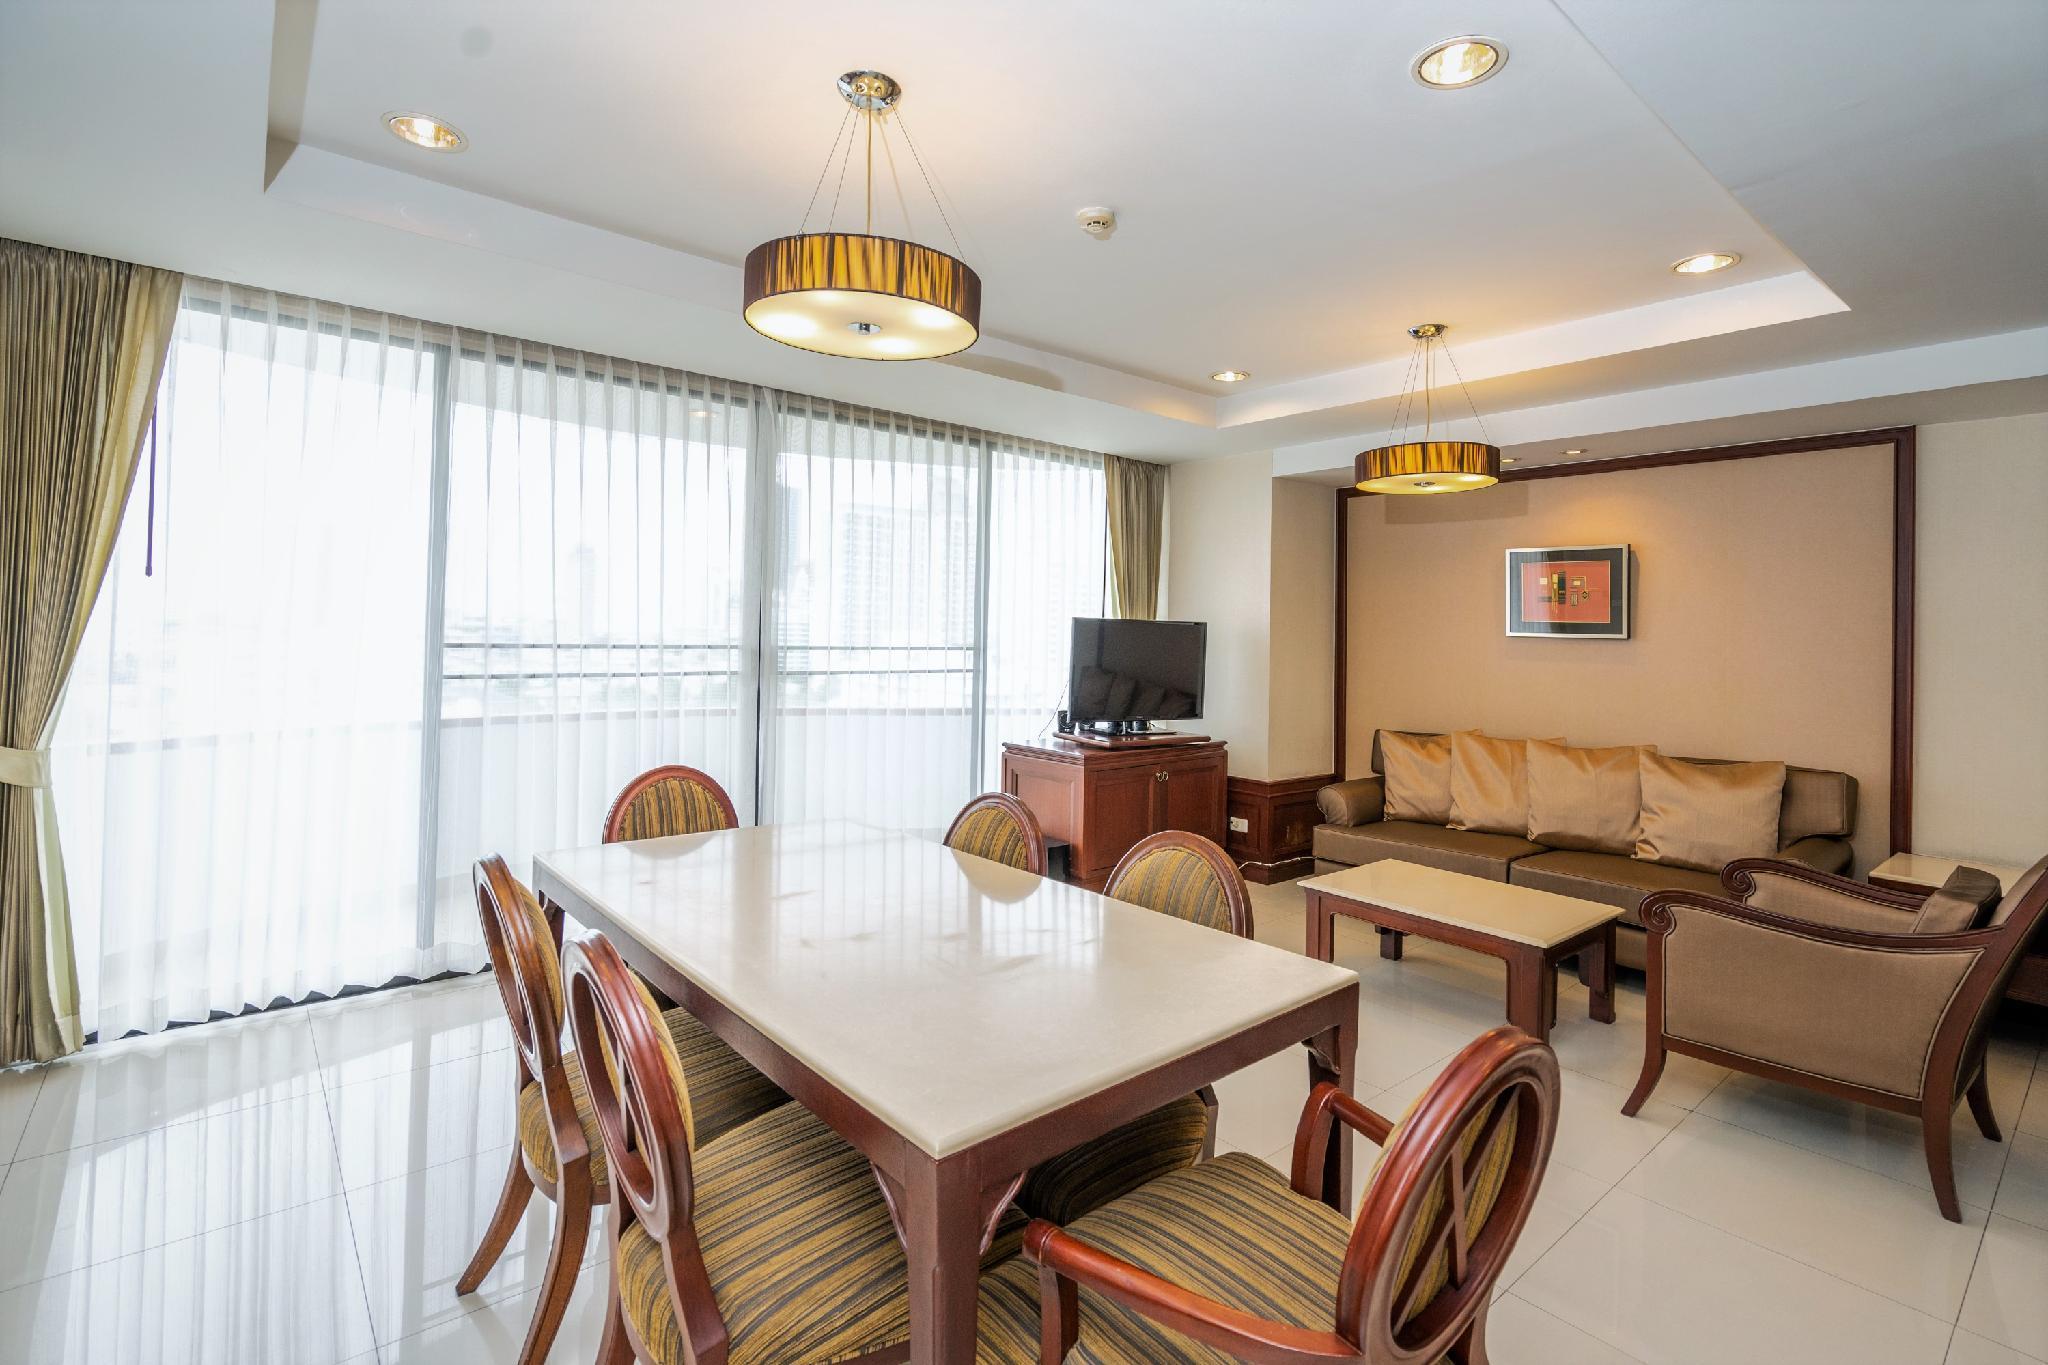 4BR Apartment Sleeps 6 Near BTS Thong Lo